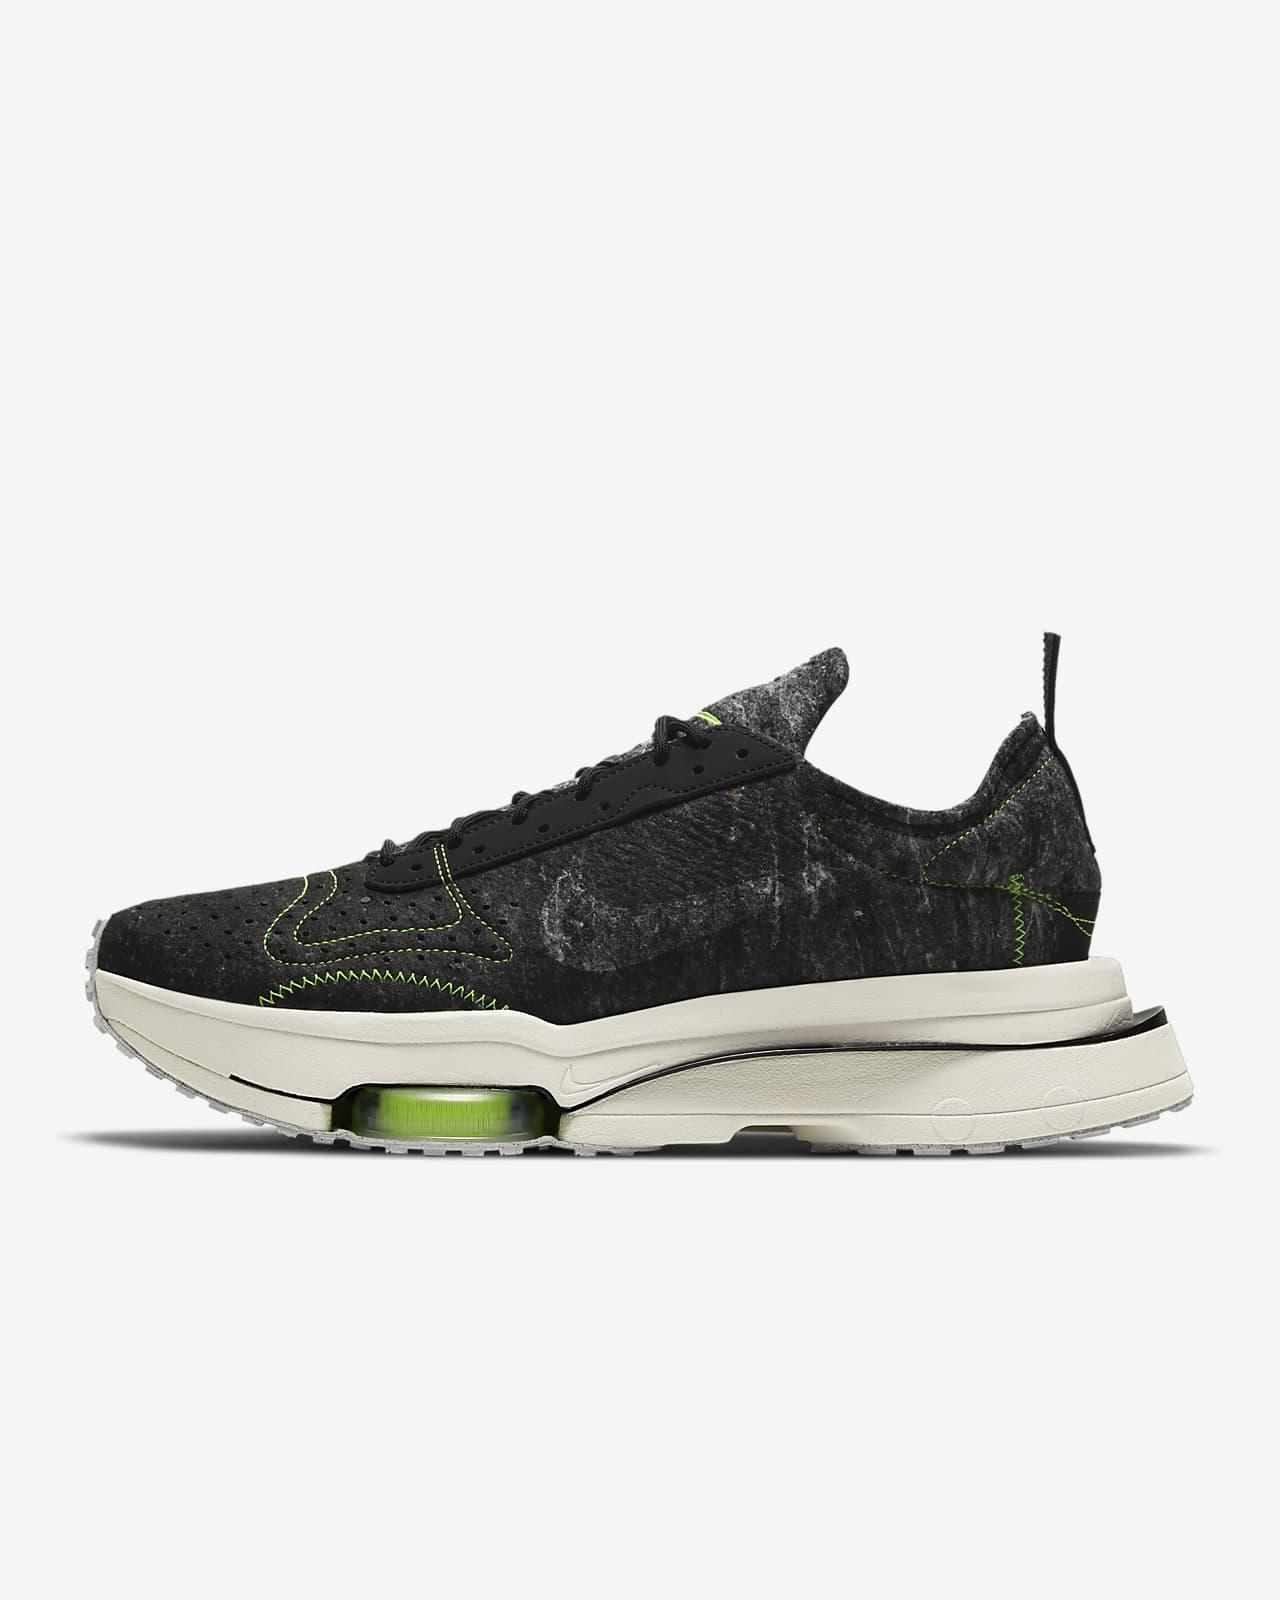 Nike Air Zoom-Type Men's Shoe